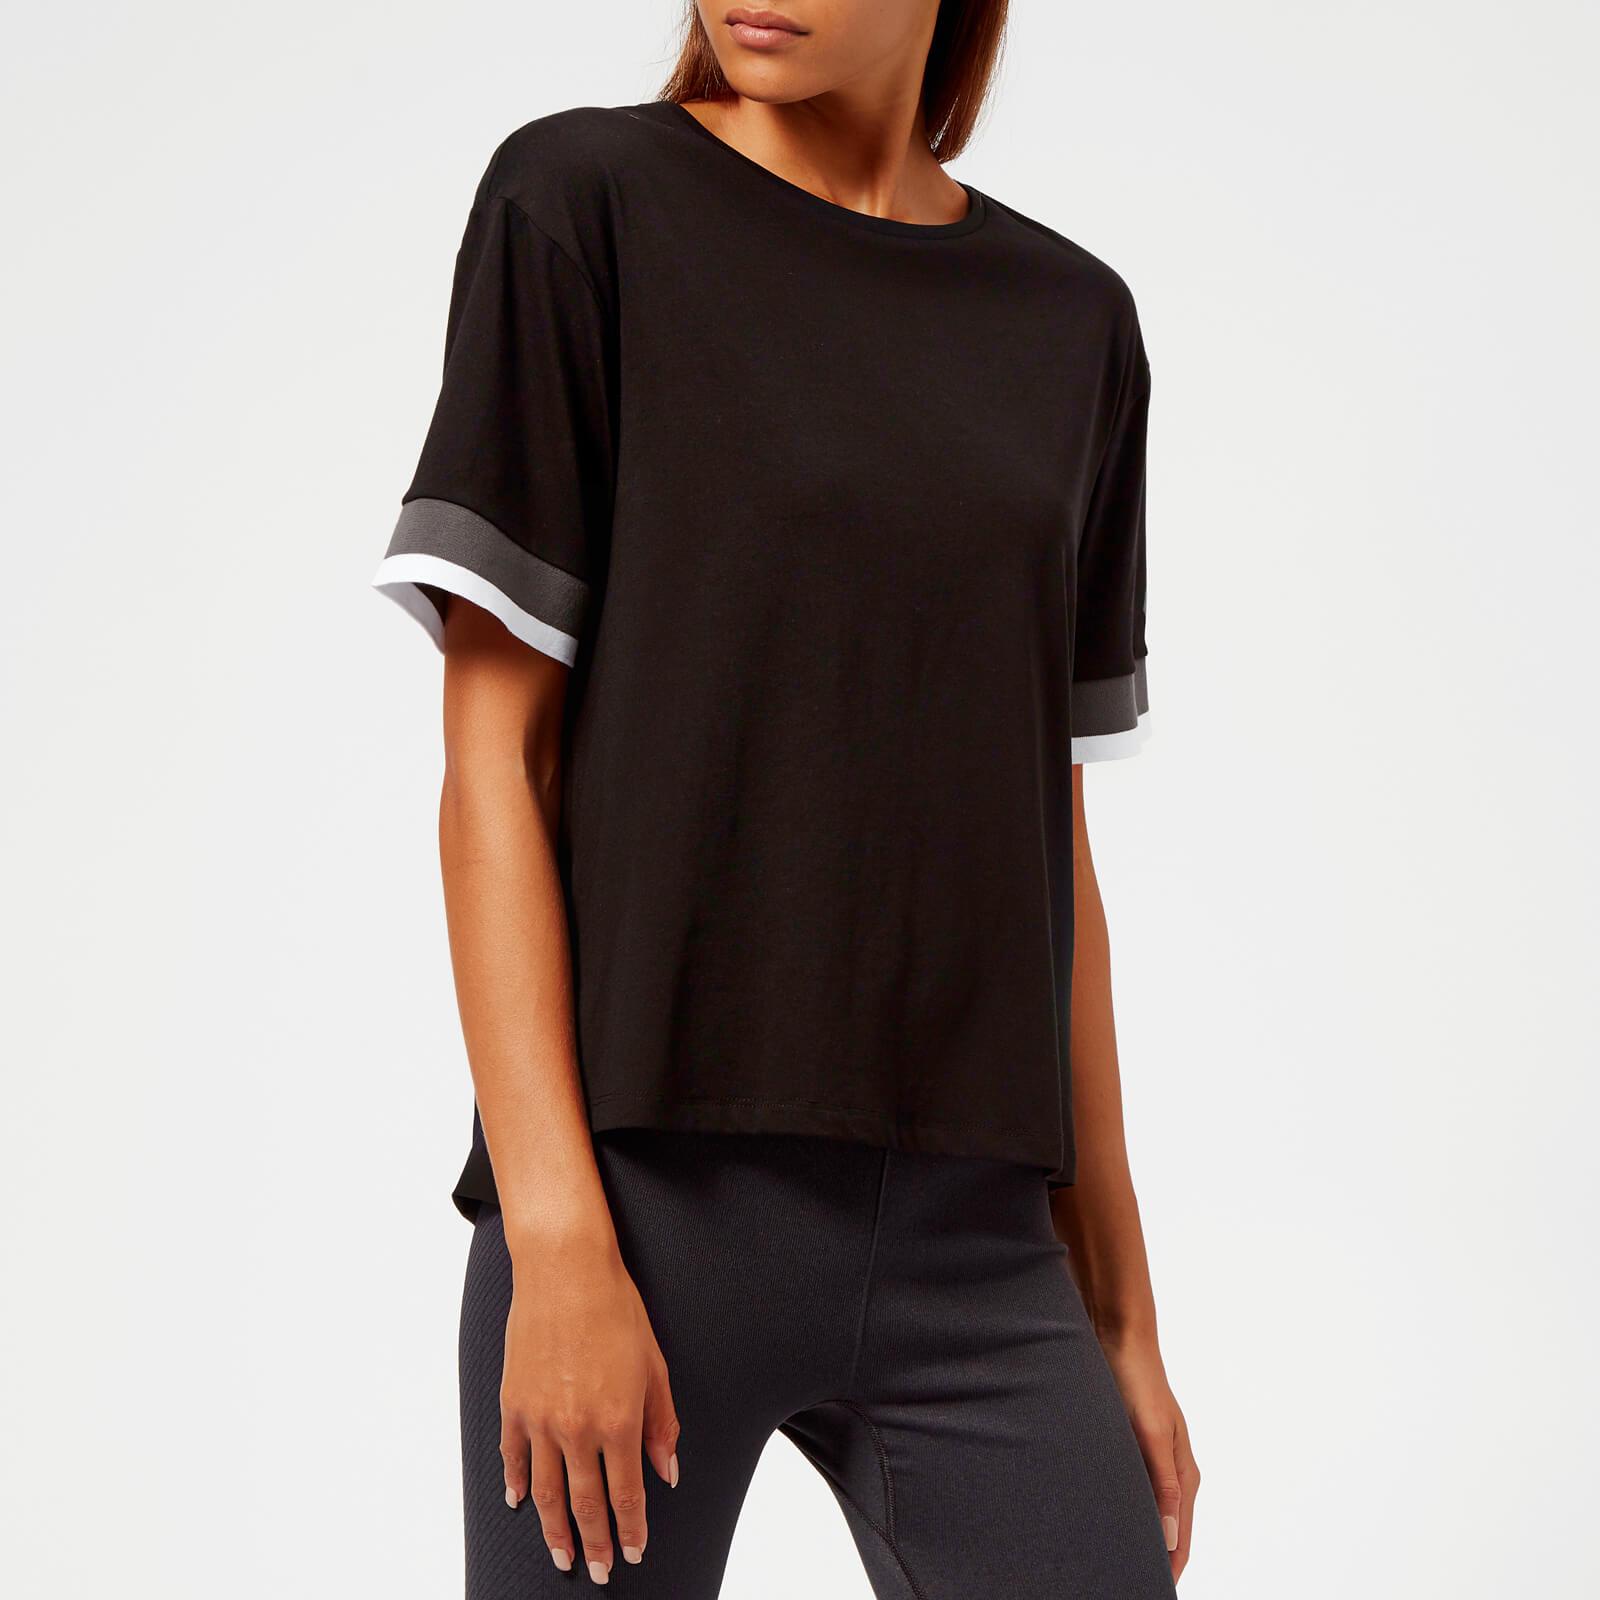 Asics Women's Mix Fabric Short Sleeve Top - Performance Black - M - Black